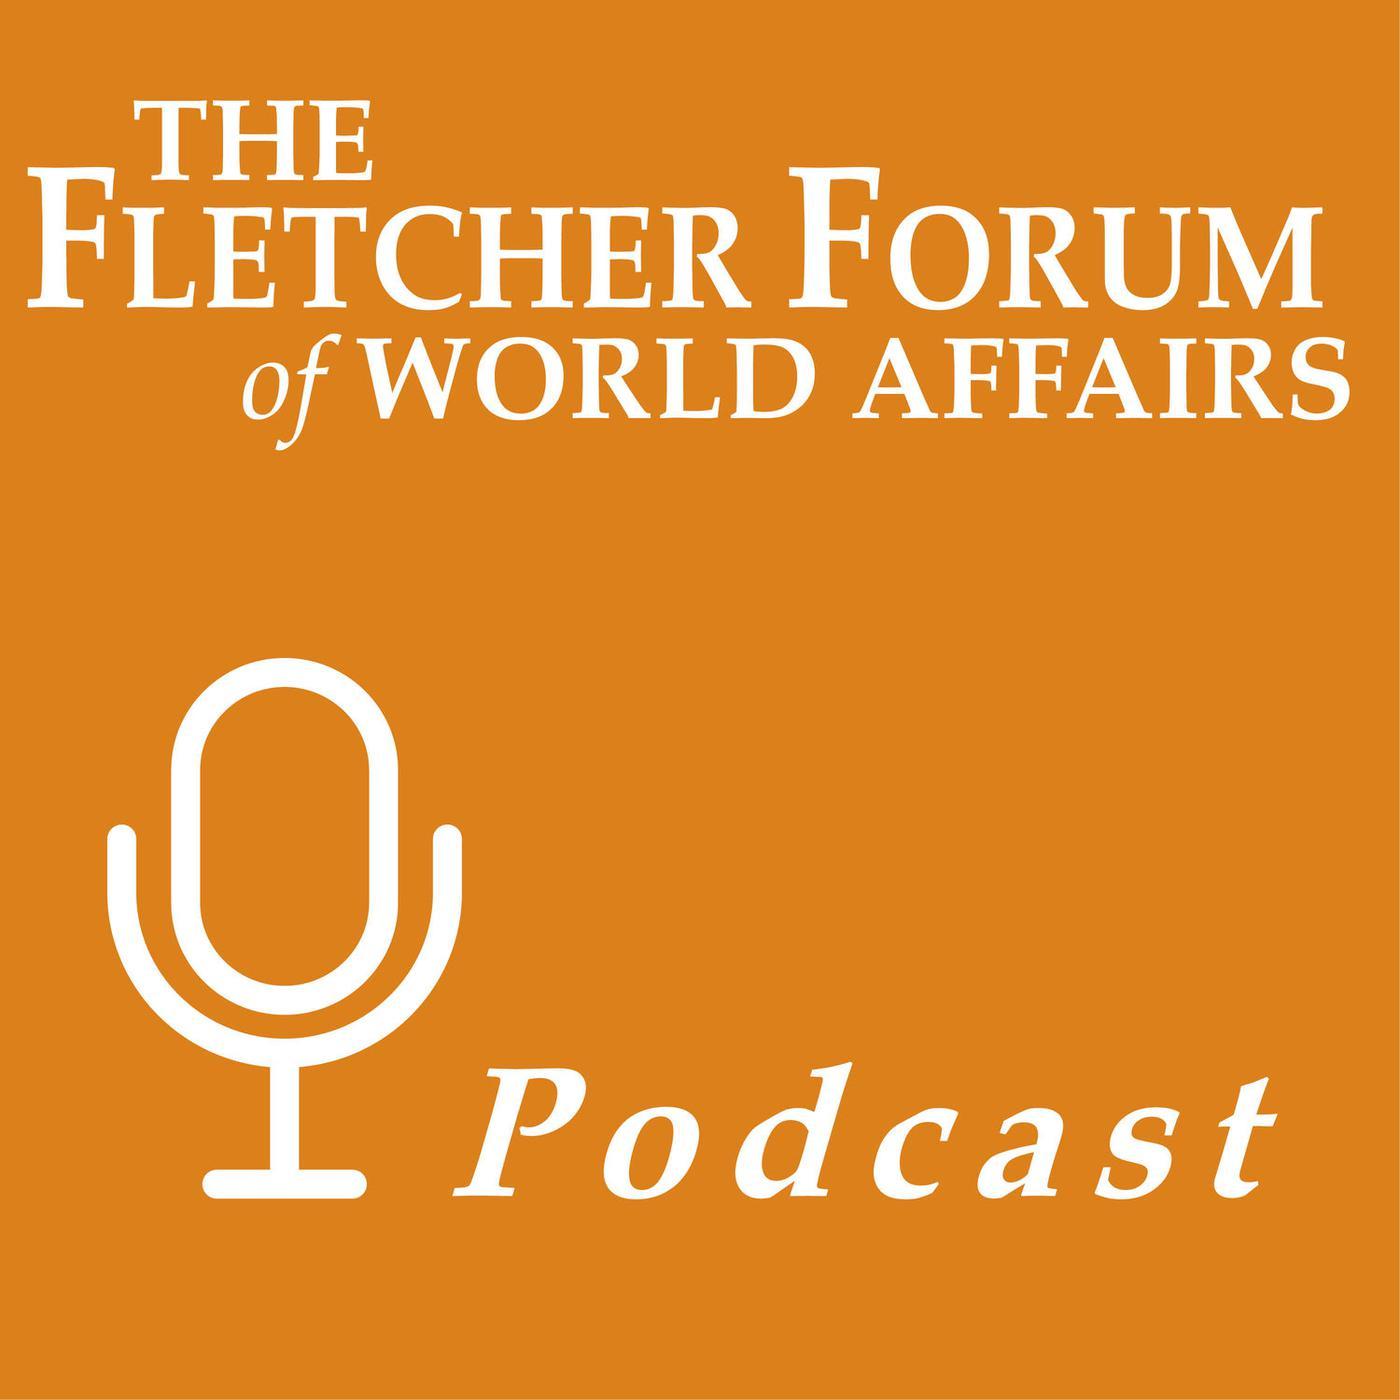 The Fletcher Forum Podcast - The Fletcher Forum | Listen Notes